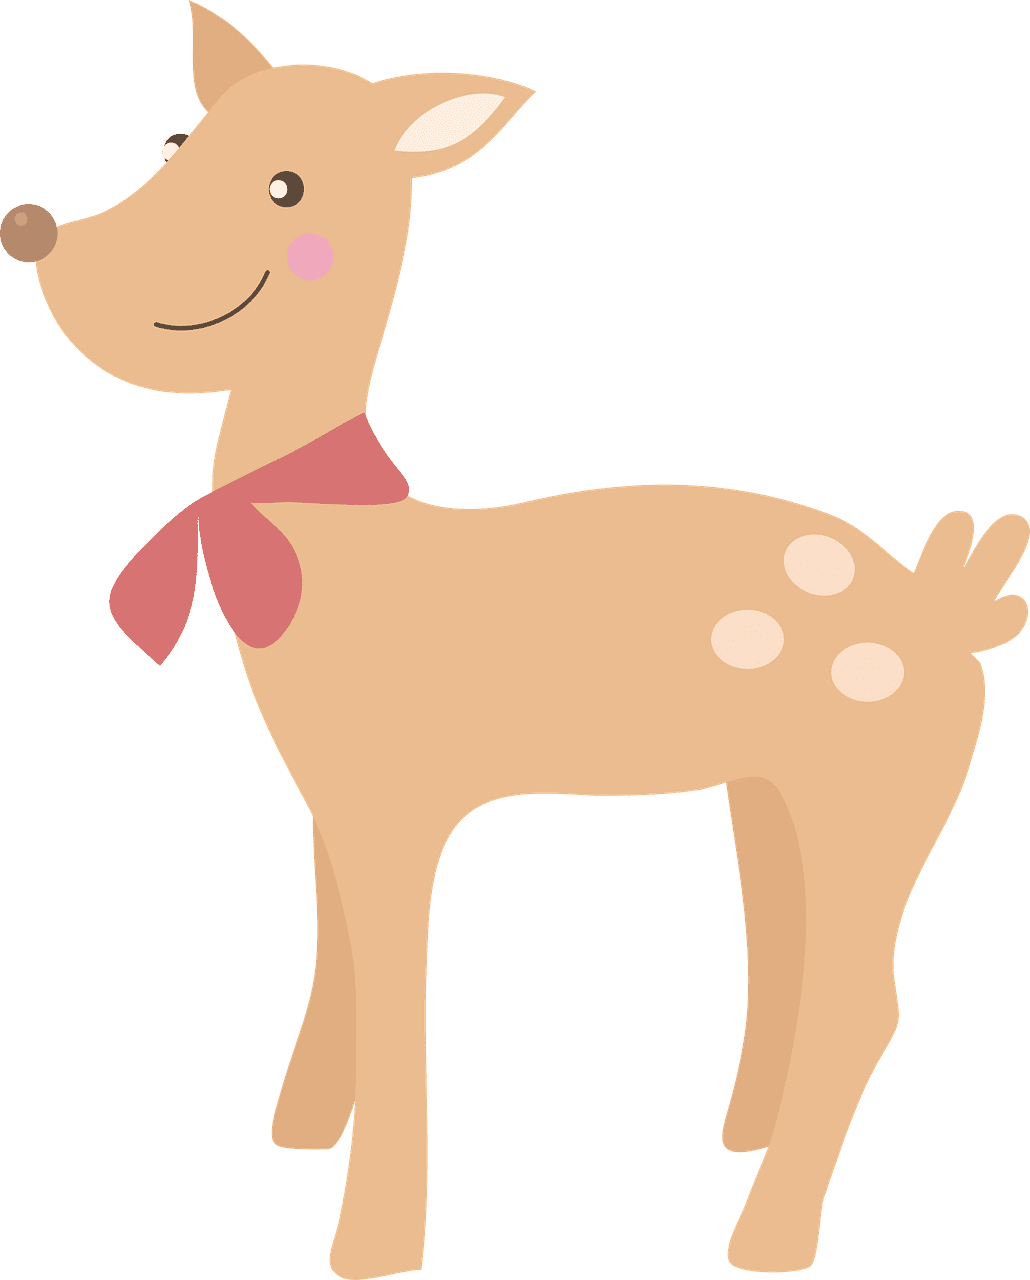 Cute Deer clipart transparent background